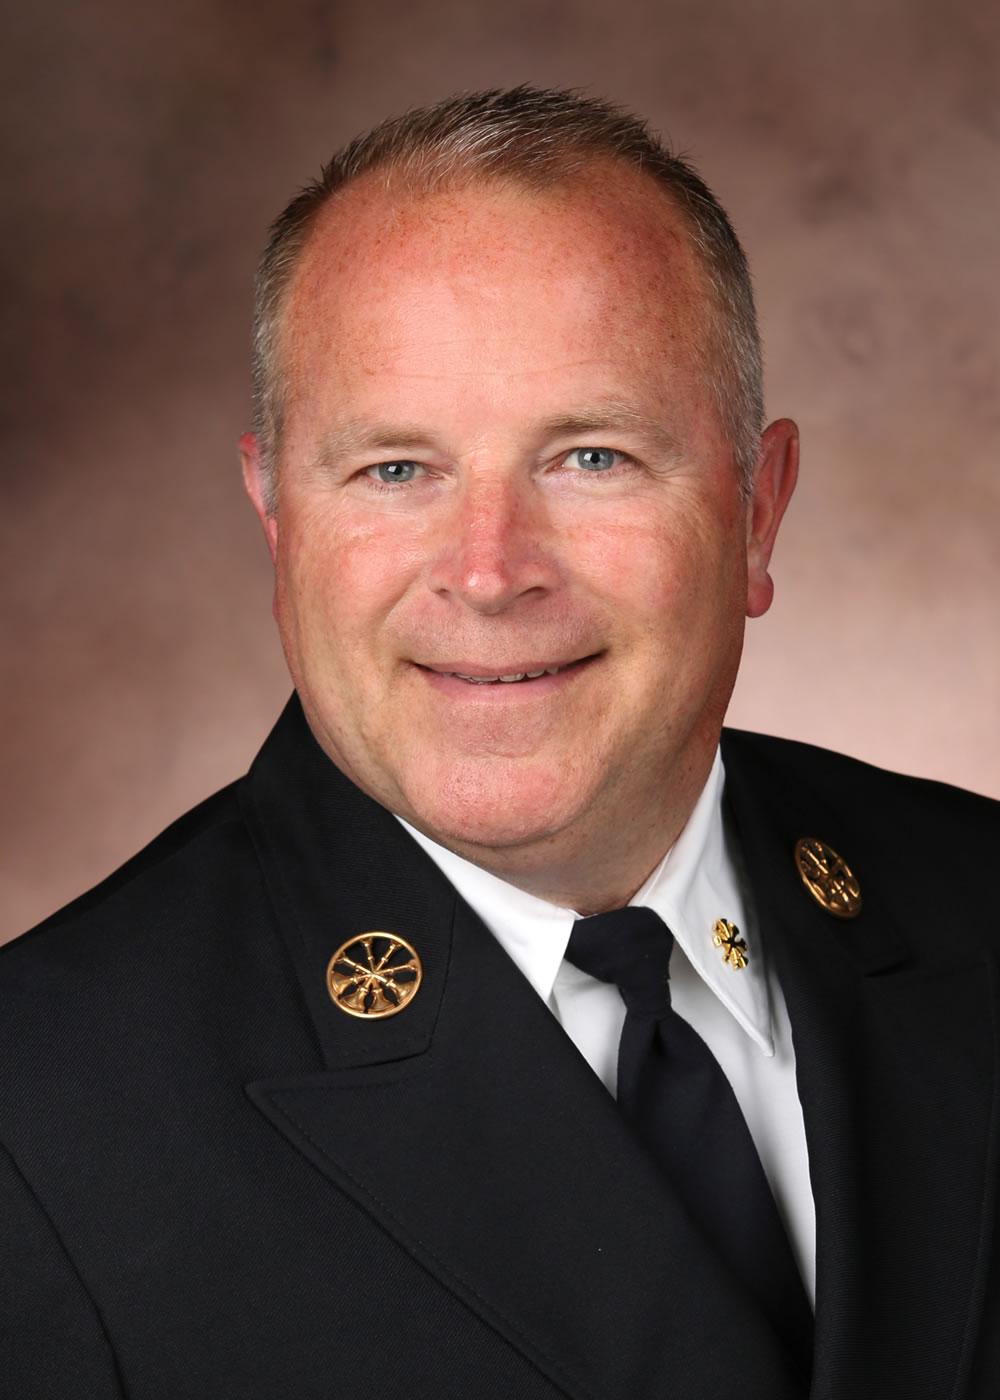 Assistant Chief Ben Shapiro